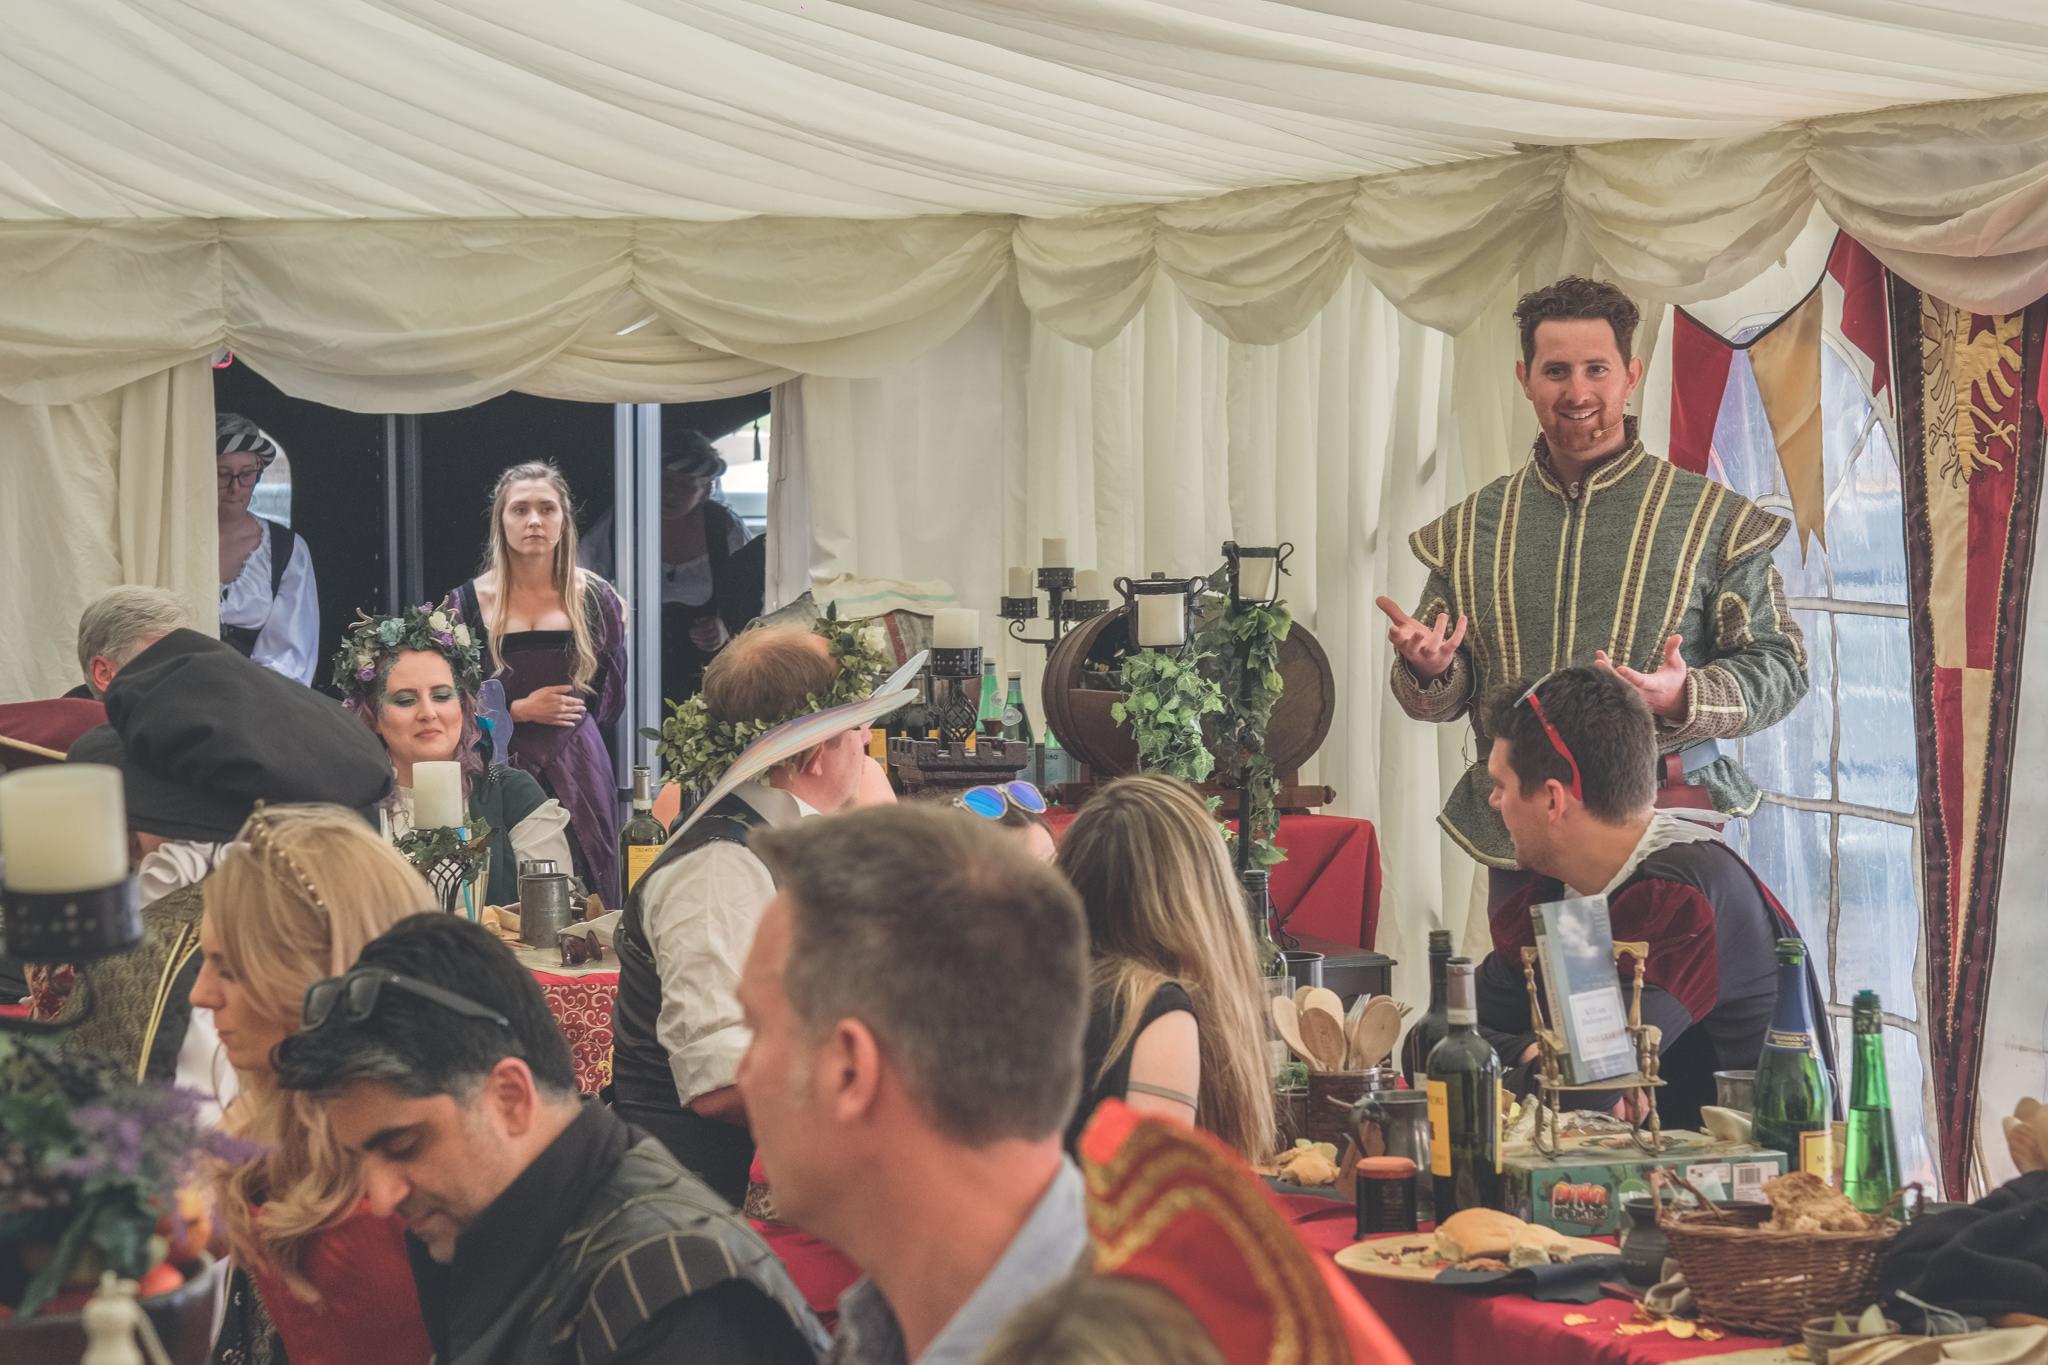 Stratford-Upon-Avon-Wedding - Robin Ball Photography-78.jpg